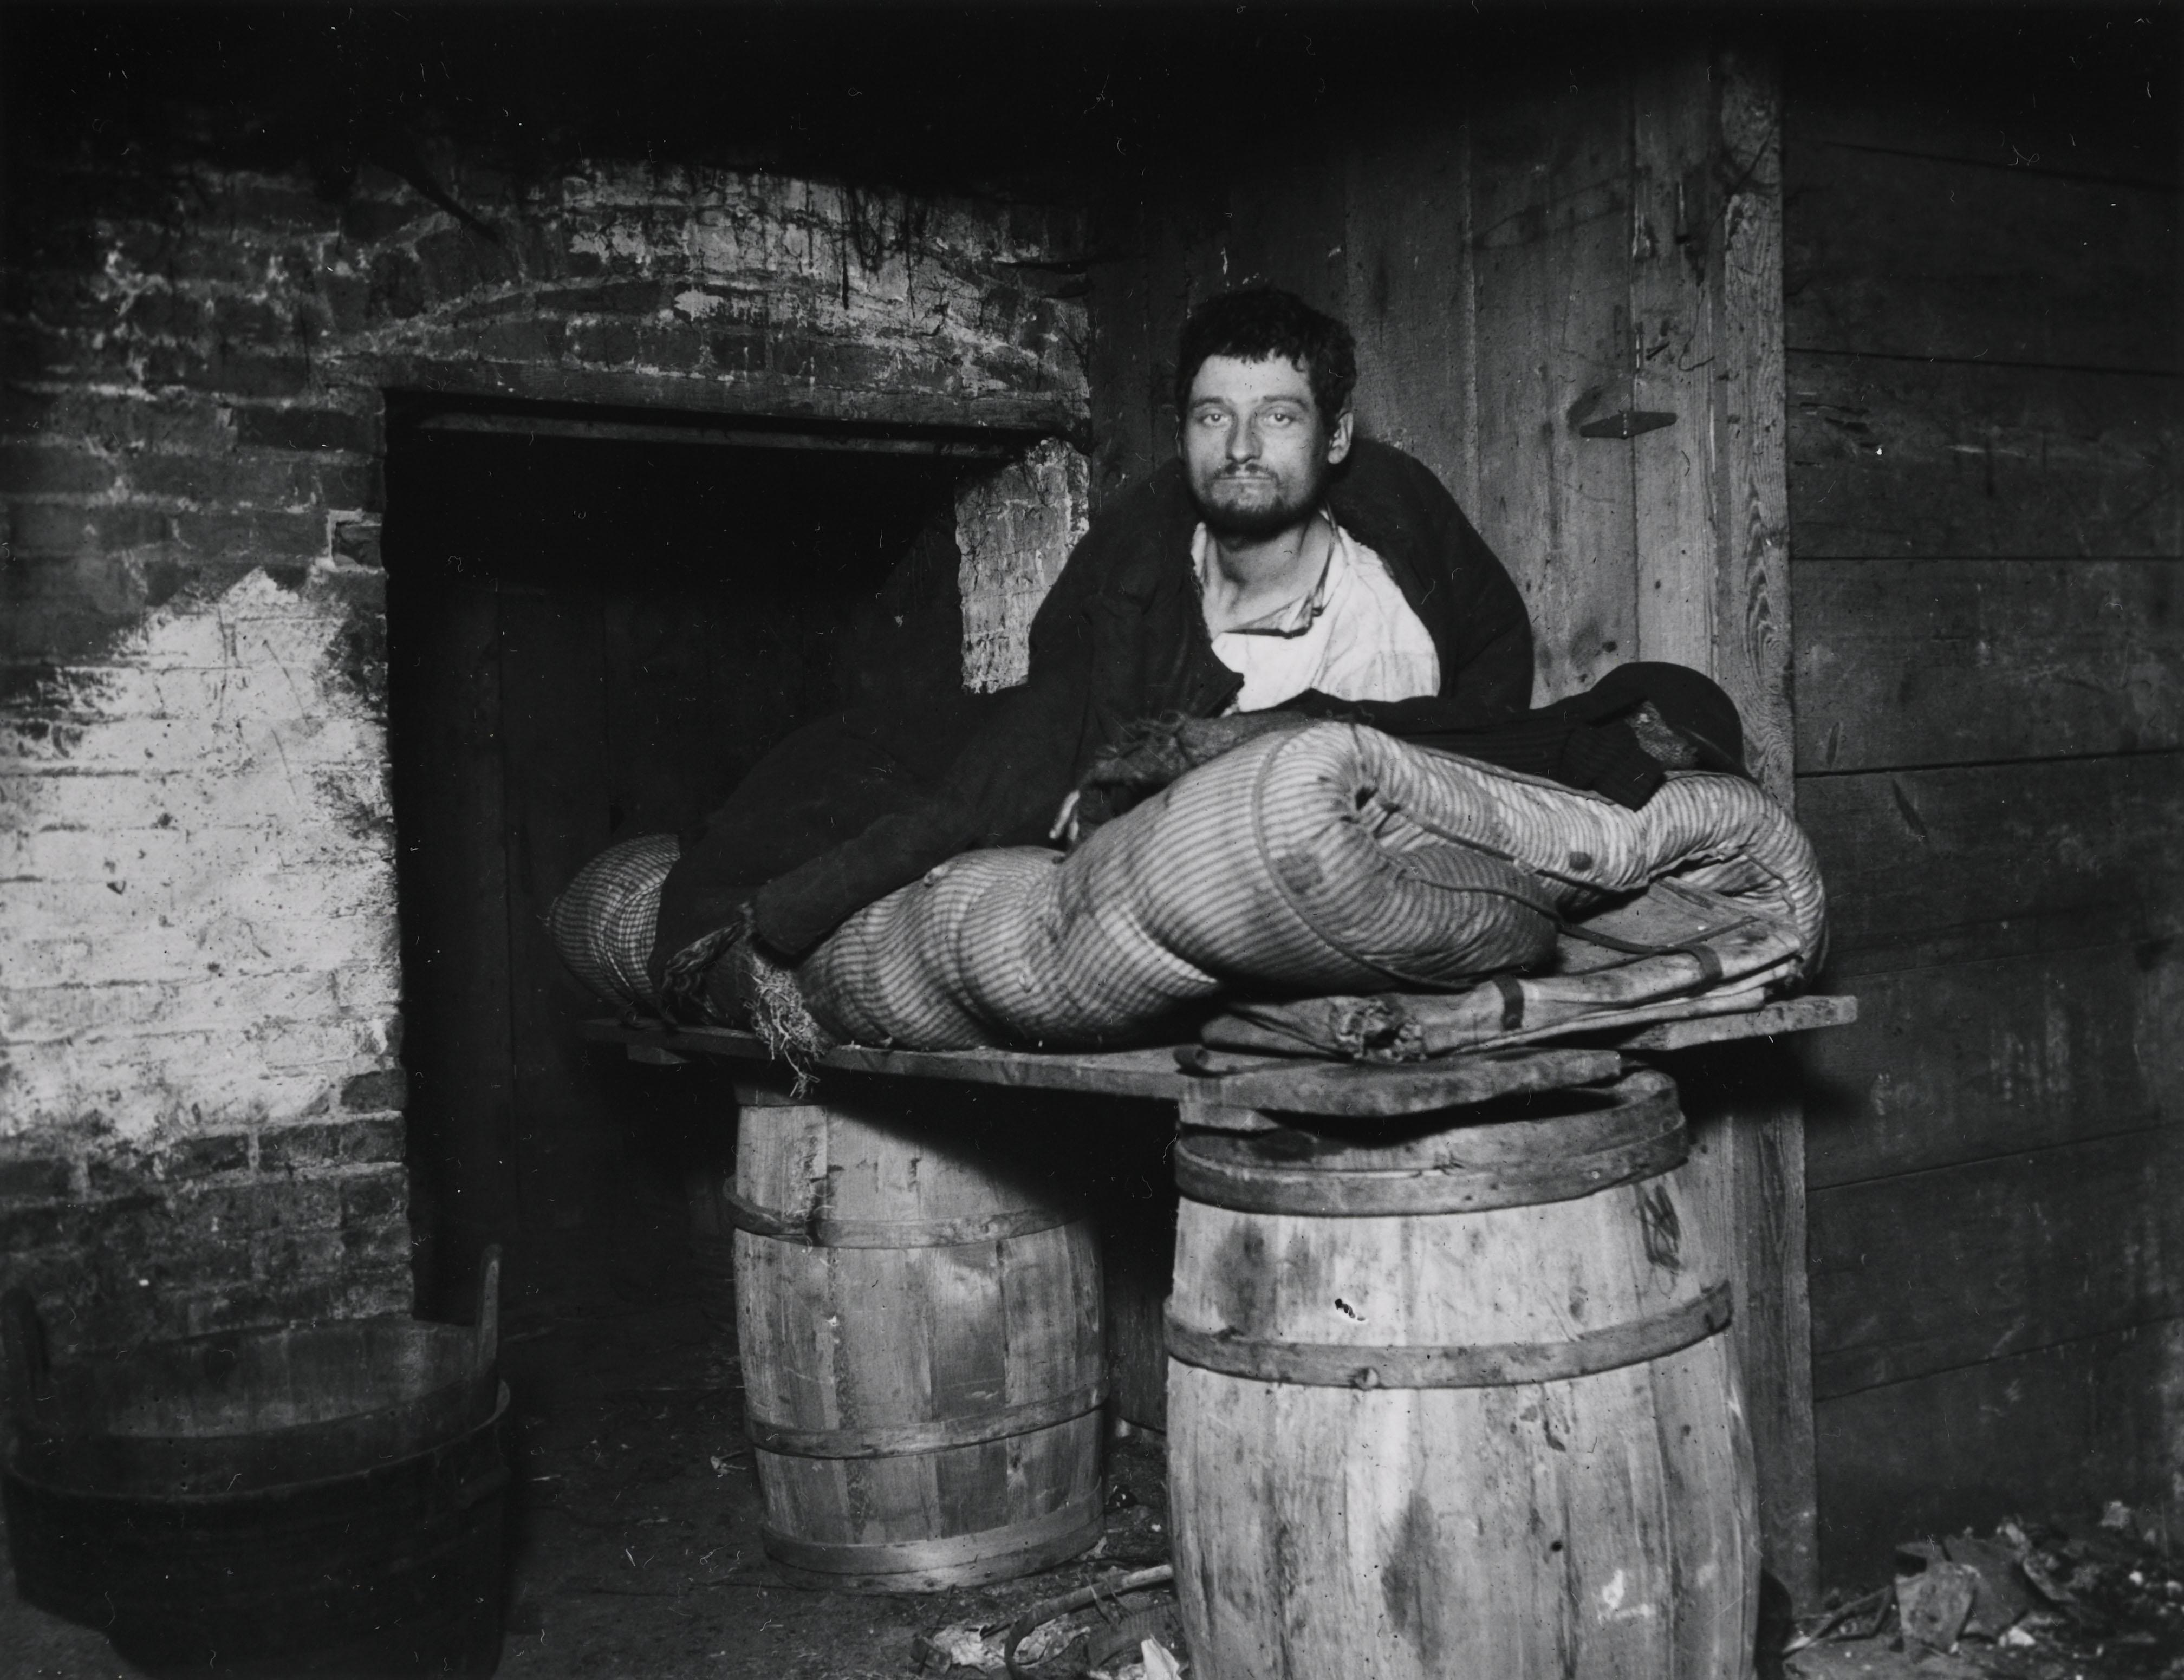 """One of four Pedlars Who Slept in the Celler of 11 Ludlow Street Rear."" Via Preus Museum"